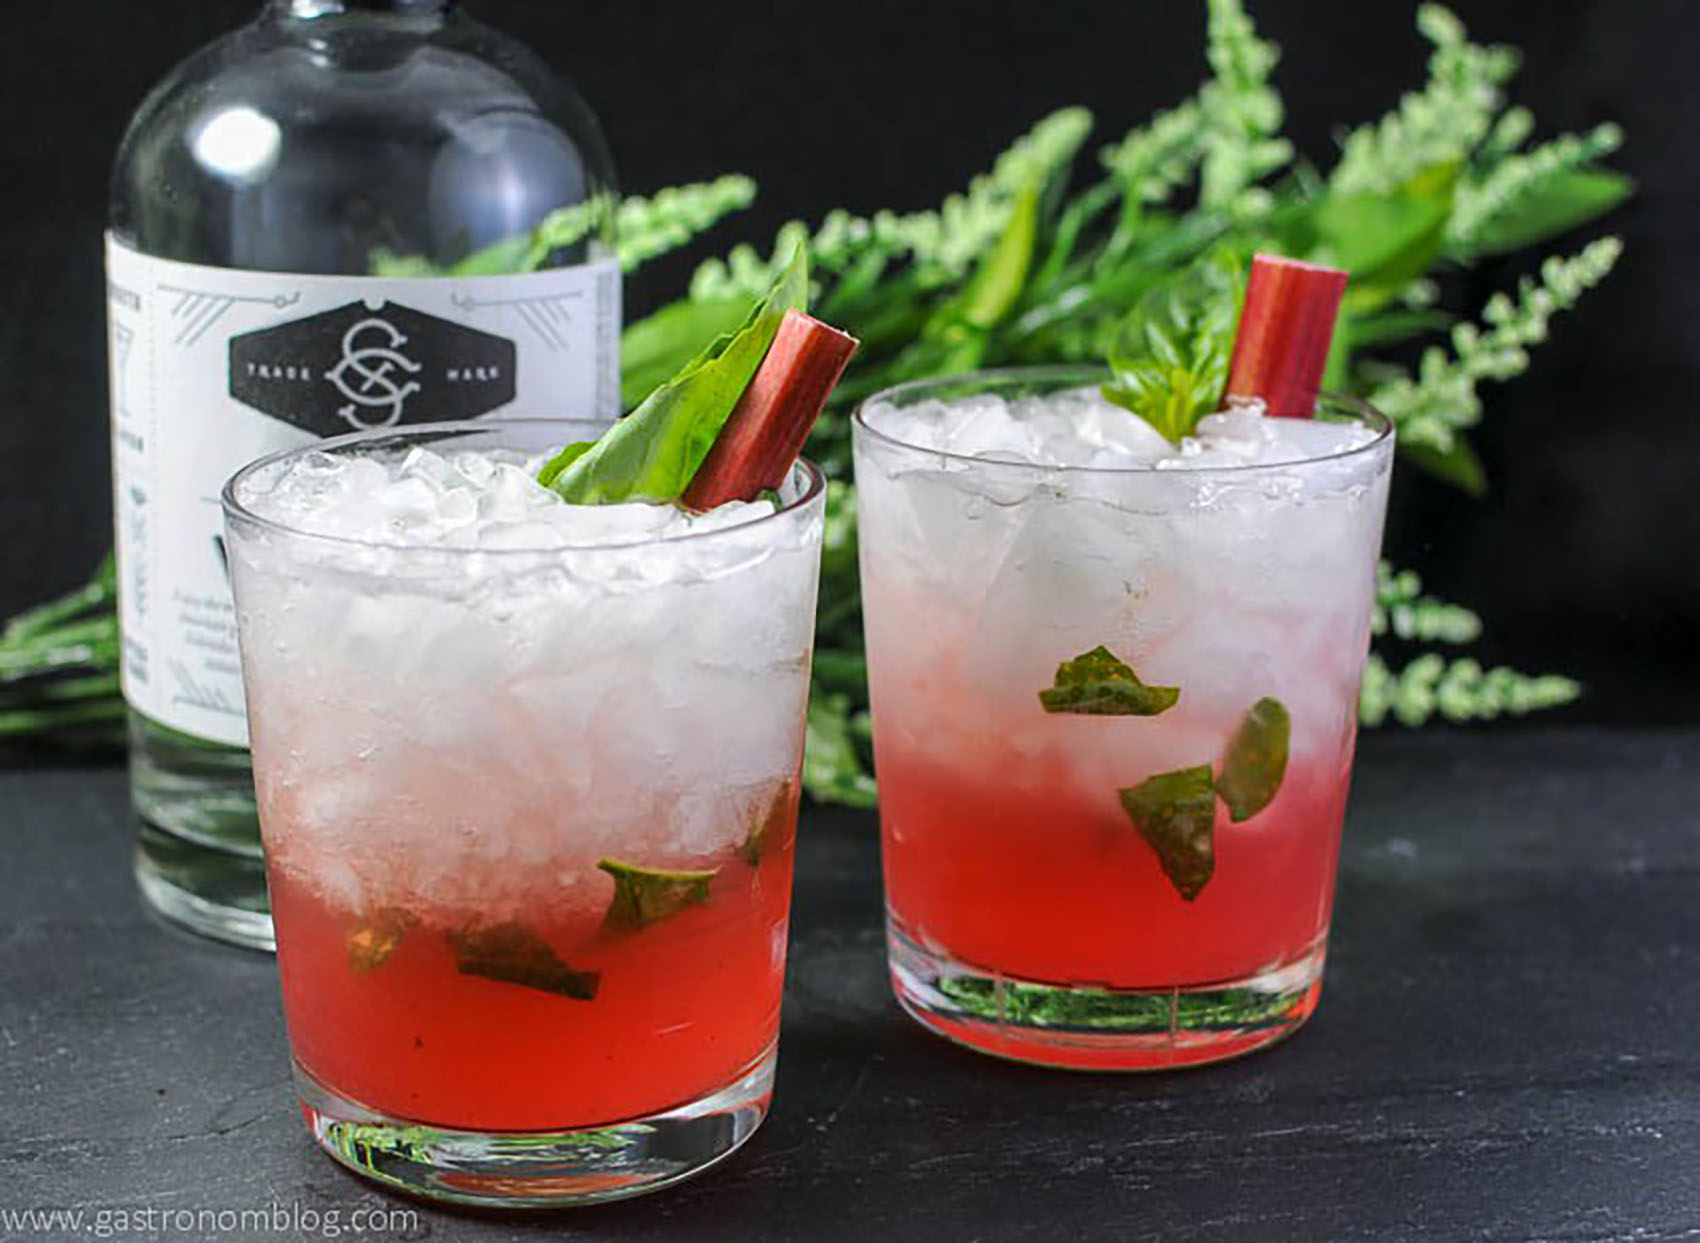 Gastronom The Rhubasil Cocktail